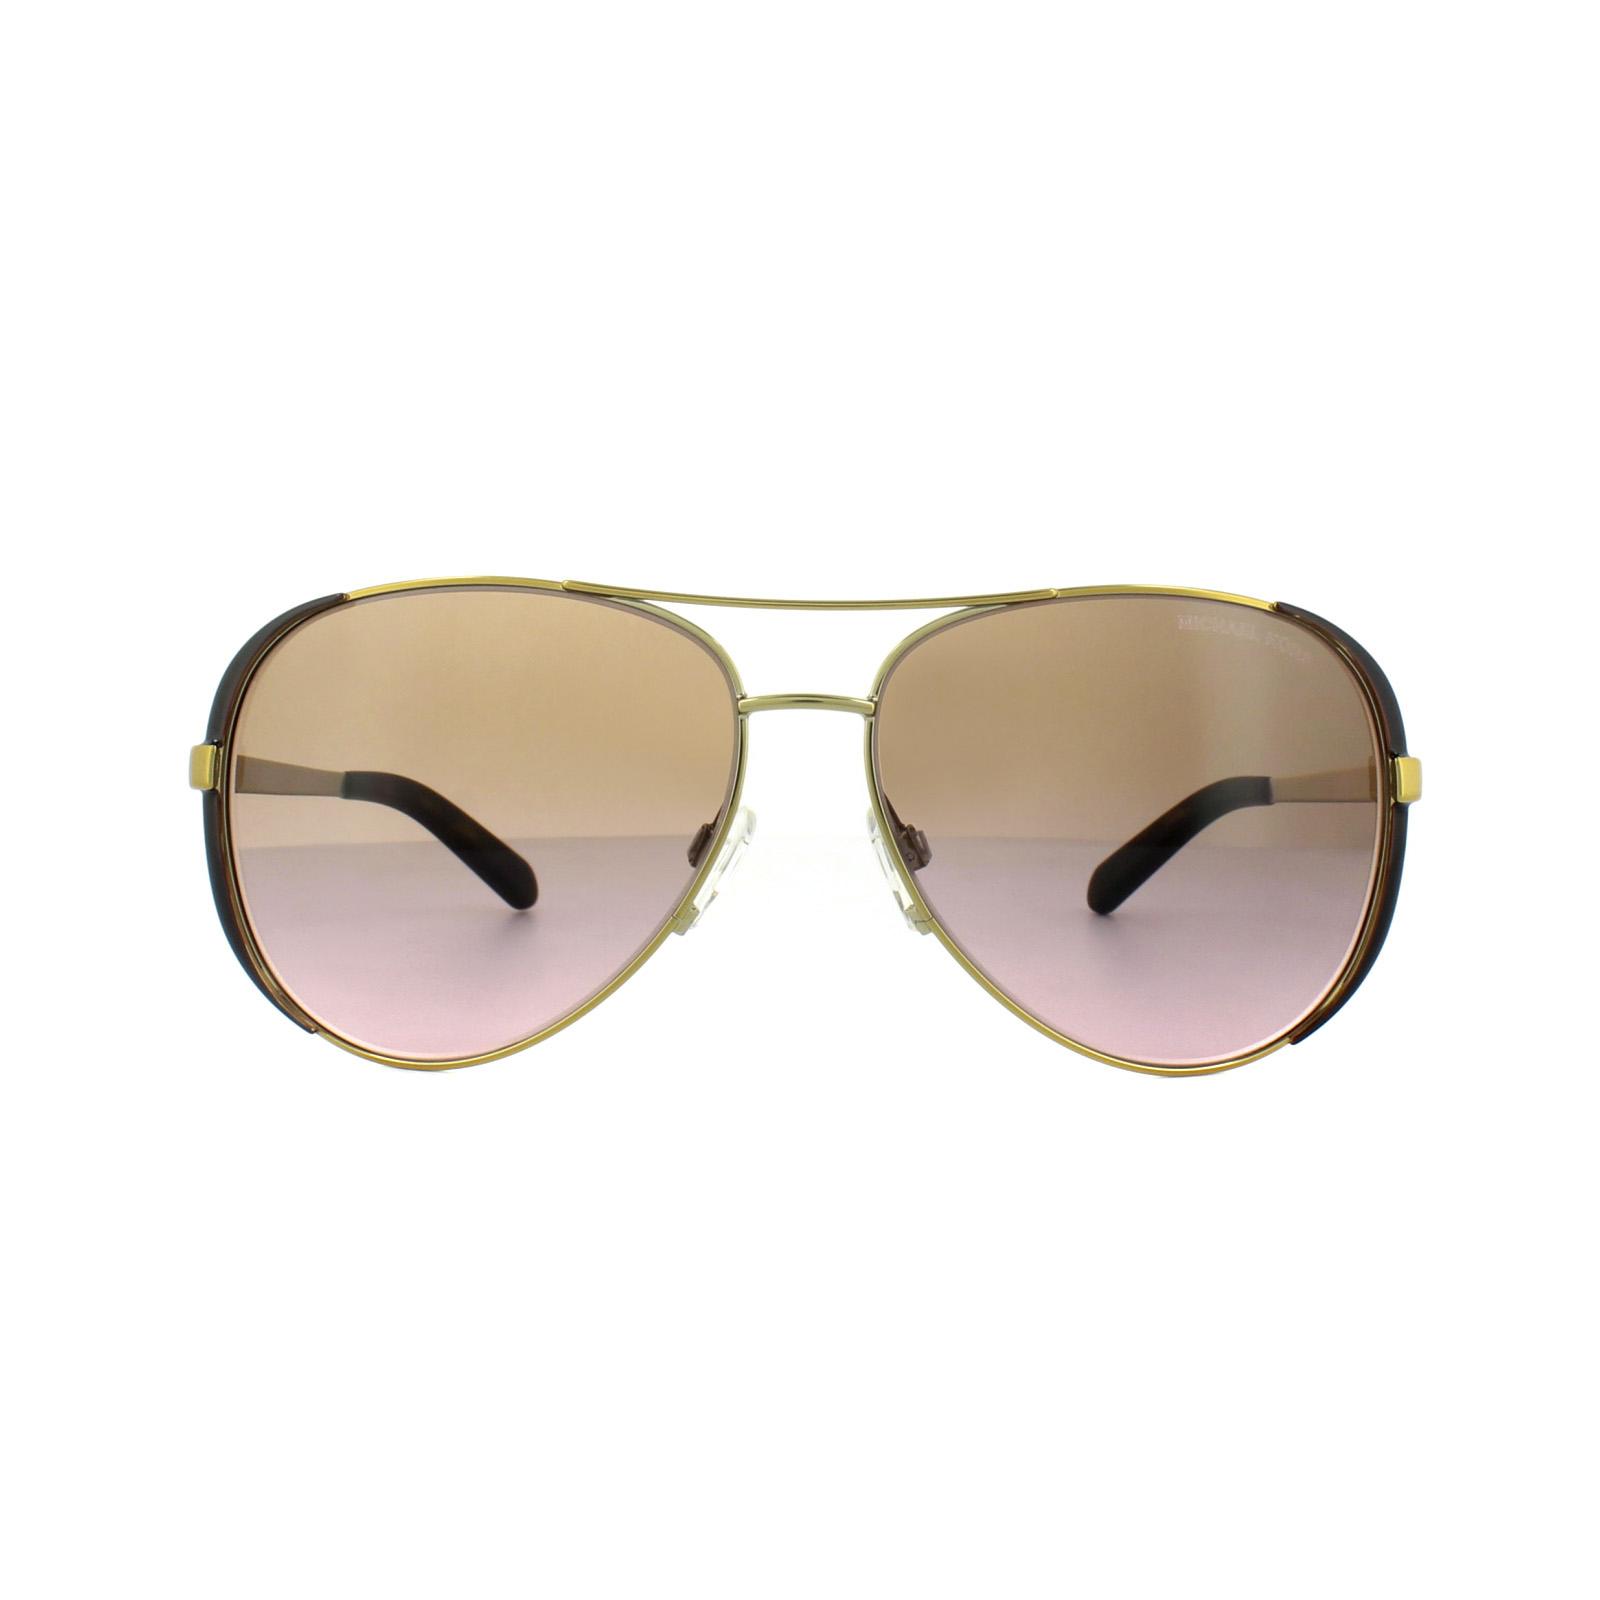 6758e2cfd1 Sentinel Thumbnail 2. Sentinel Michael Kors Sunglasses Chelsea 5004 1014 14  Gold ...